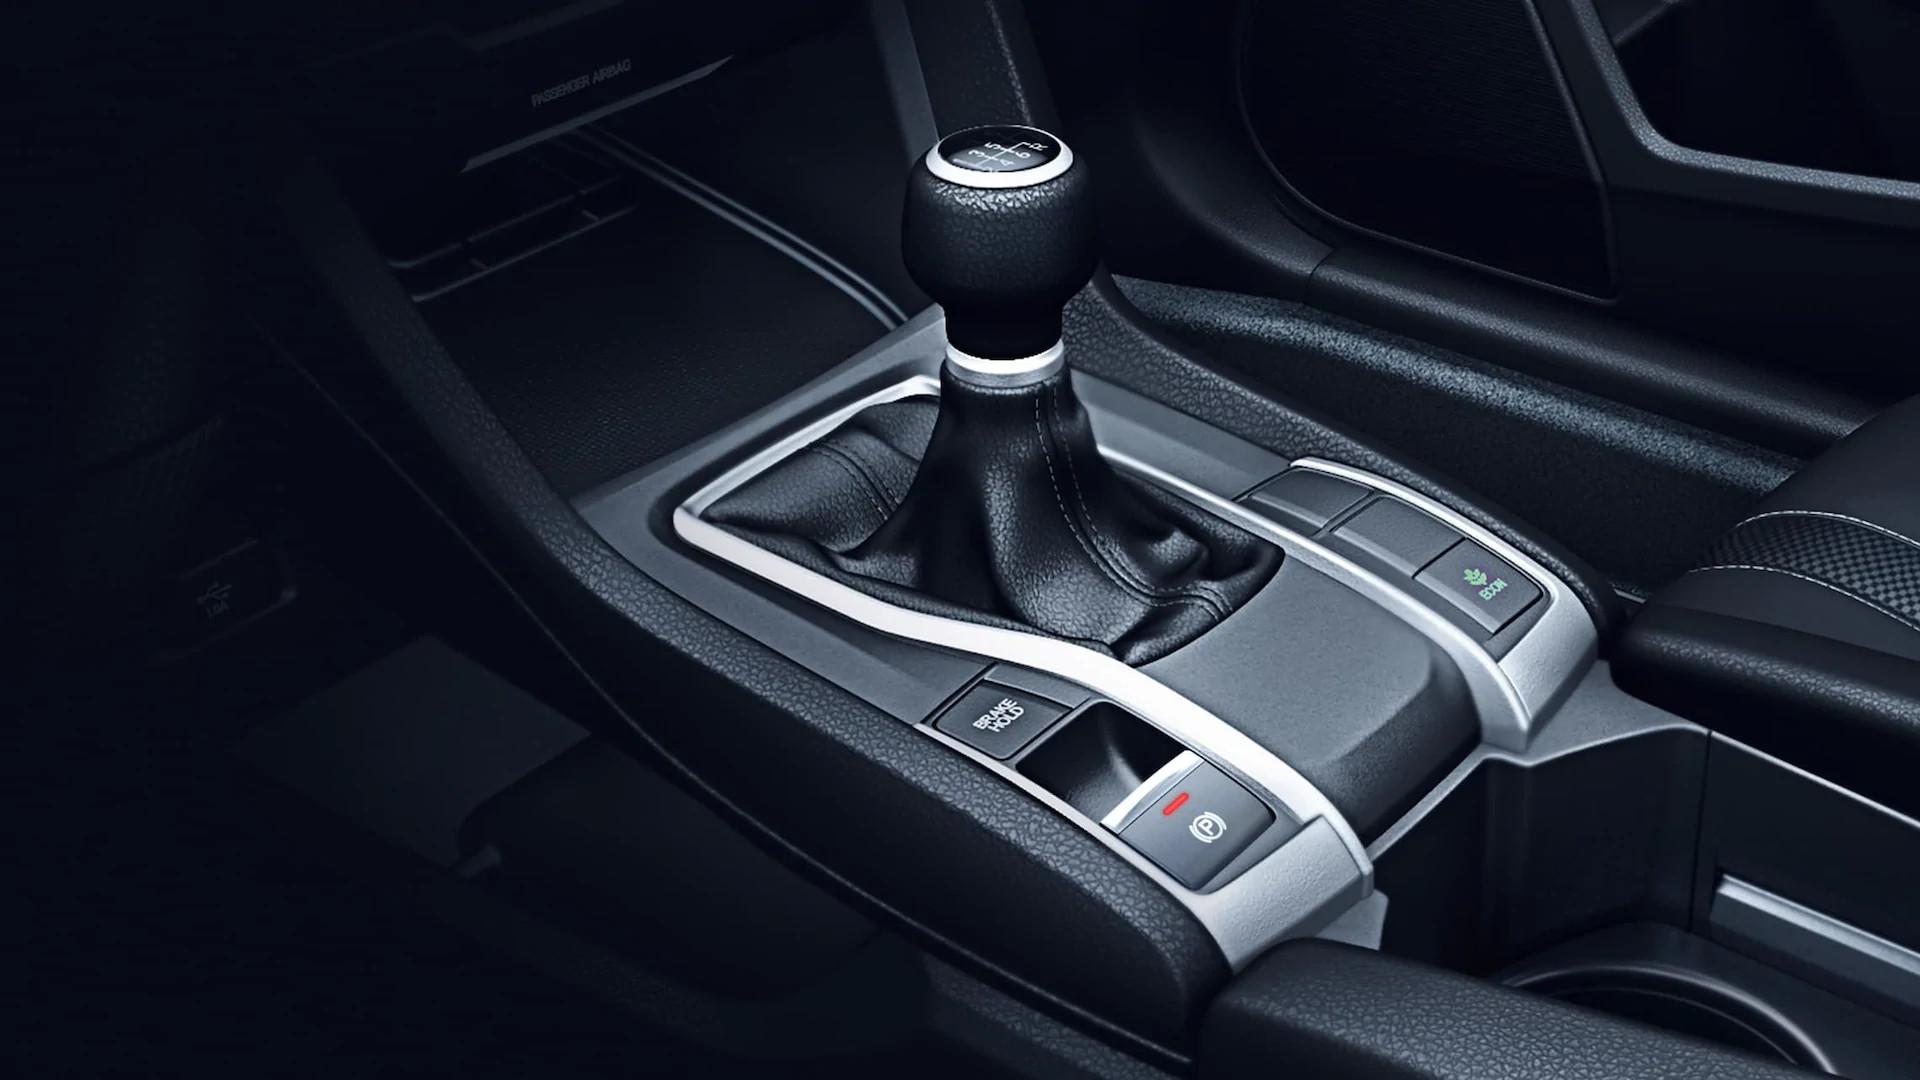 Gear Shift in the 2020 Honda Civic